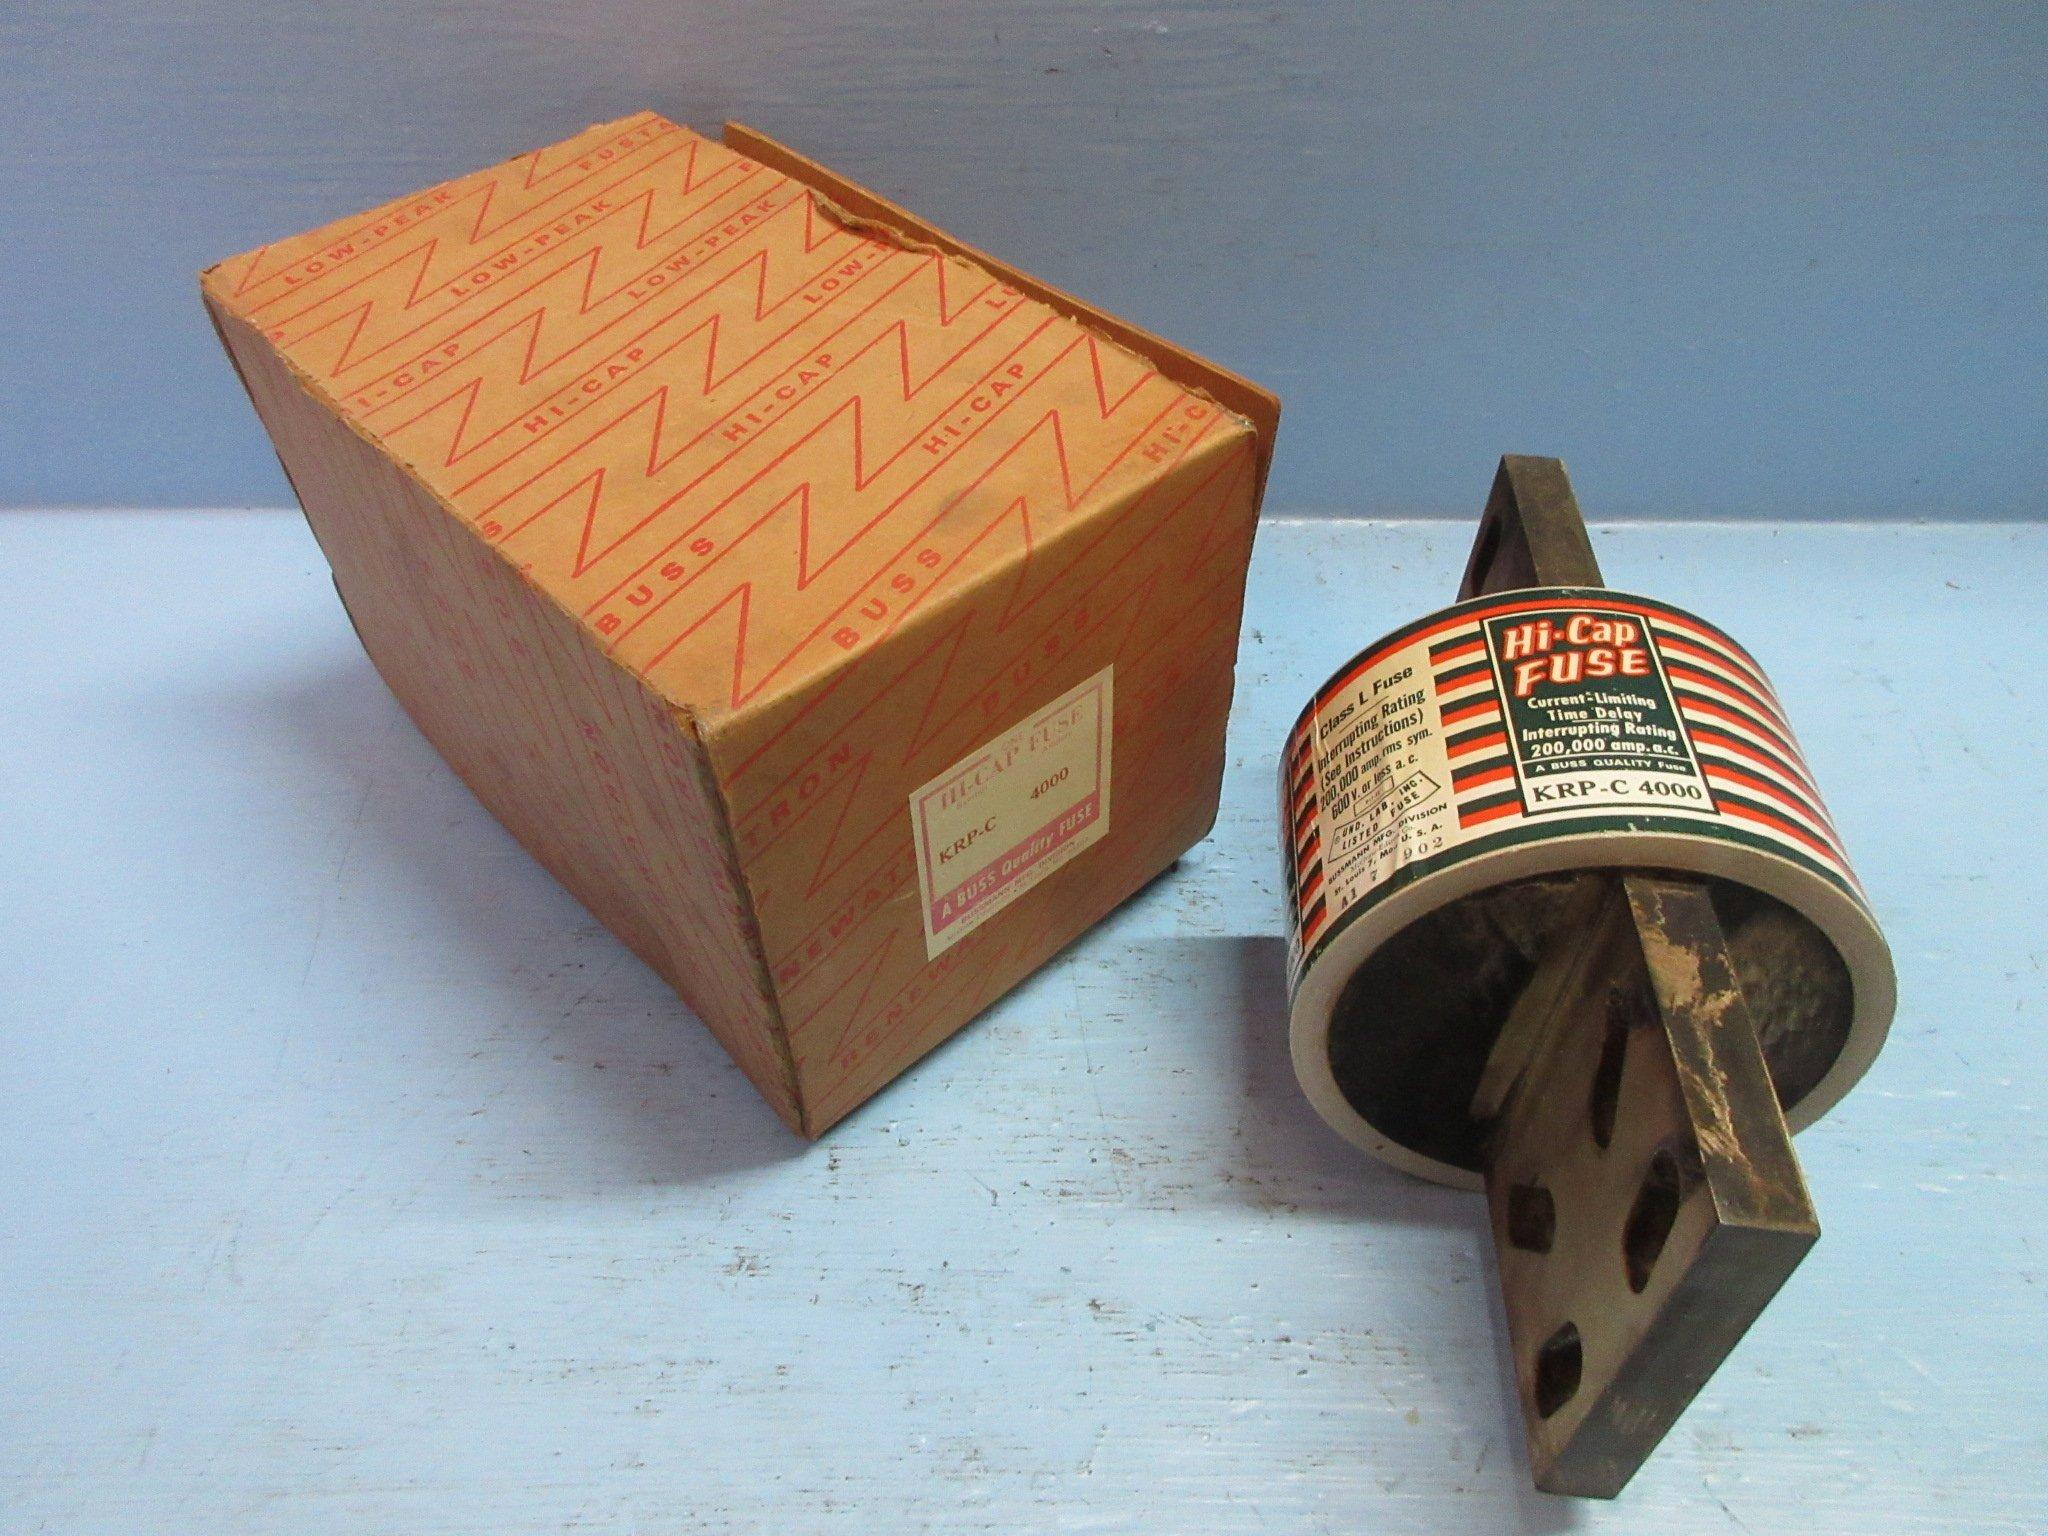 BUSSMANN KRP-C4000 *USED*